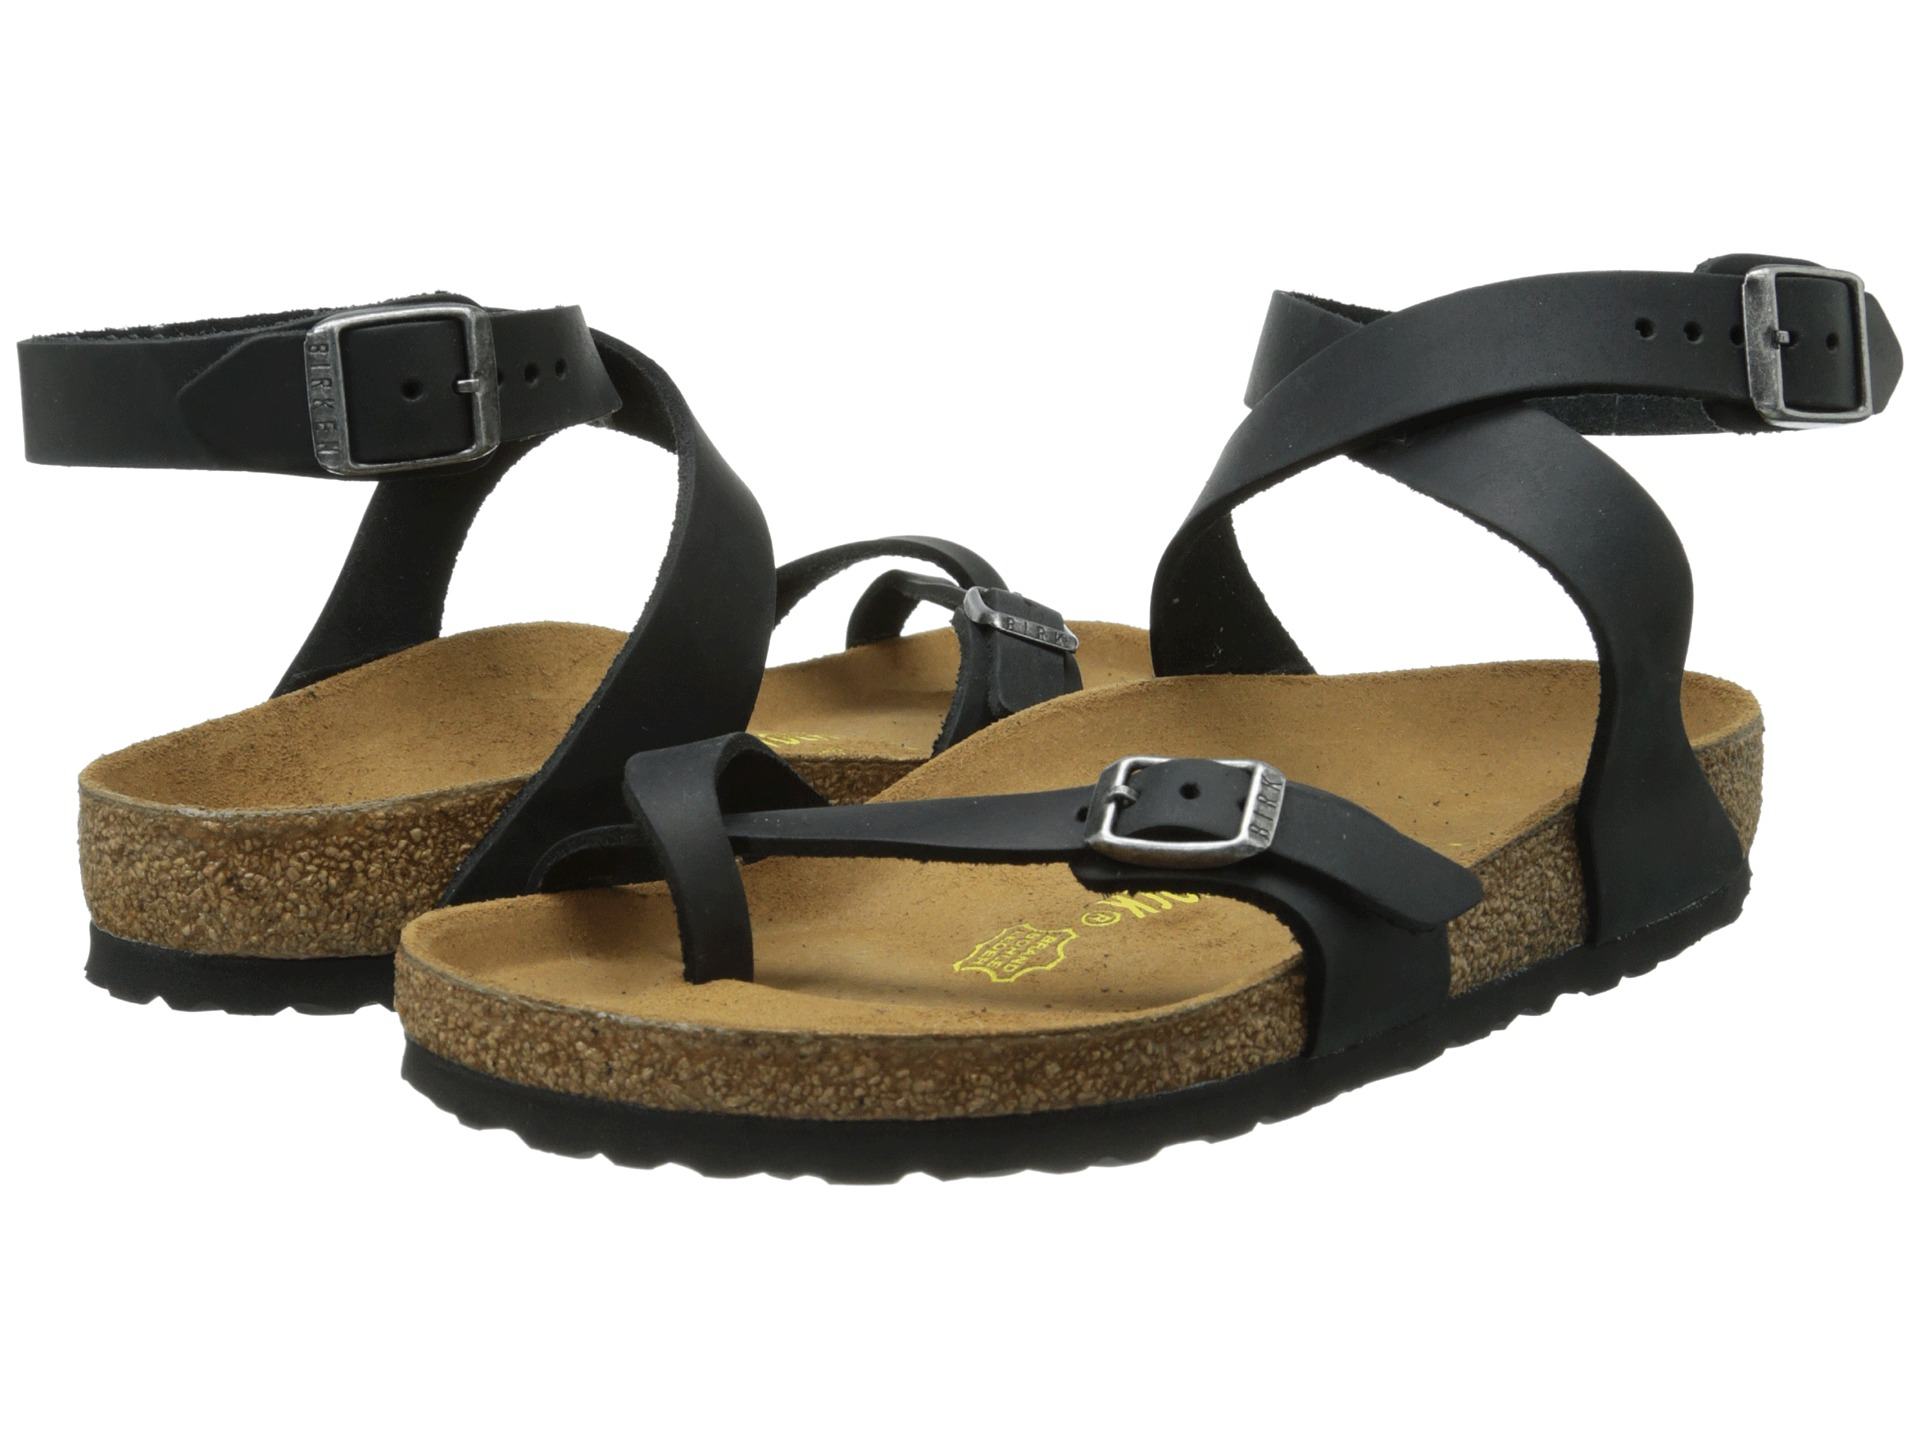 06551468dba6 Lyst - Birkenstock Yara Oiled Leather in Black